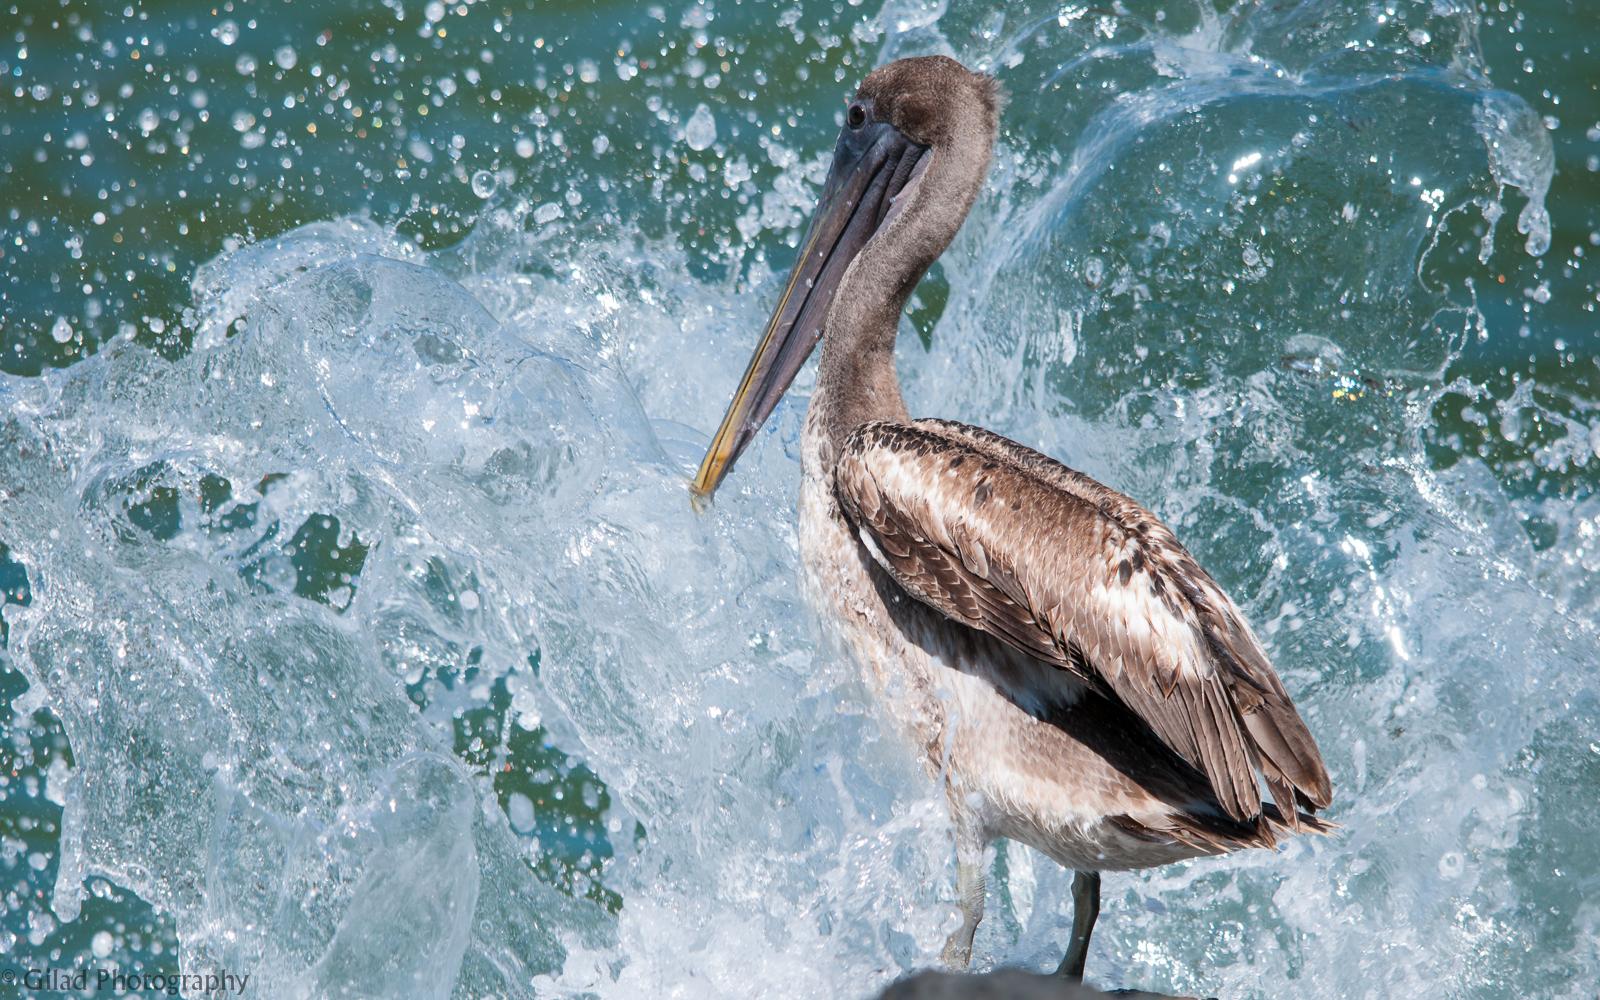 A-Pelican-Getting-Splashed.jpg